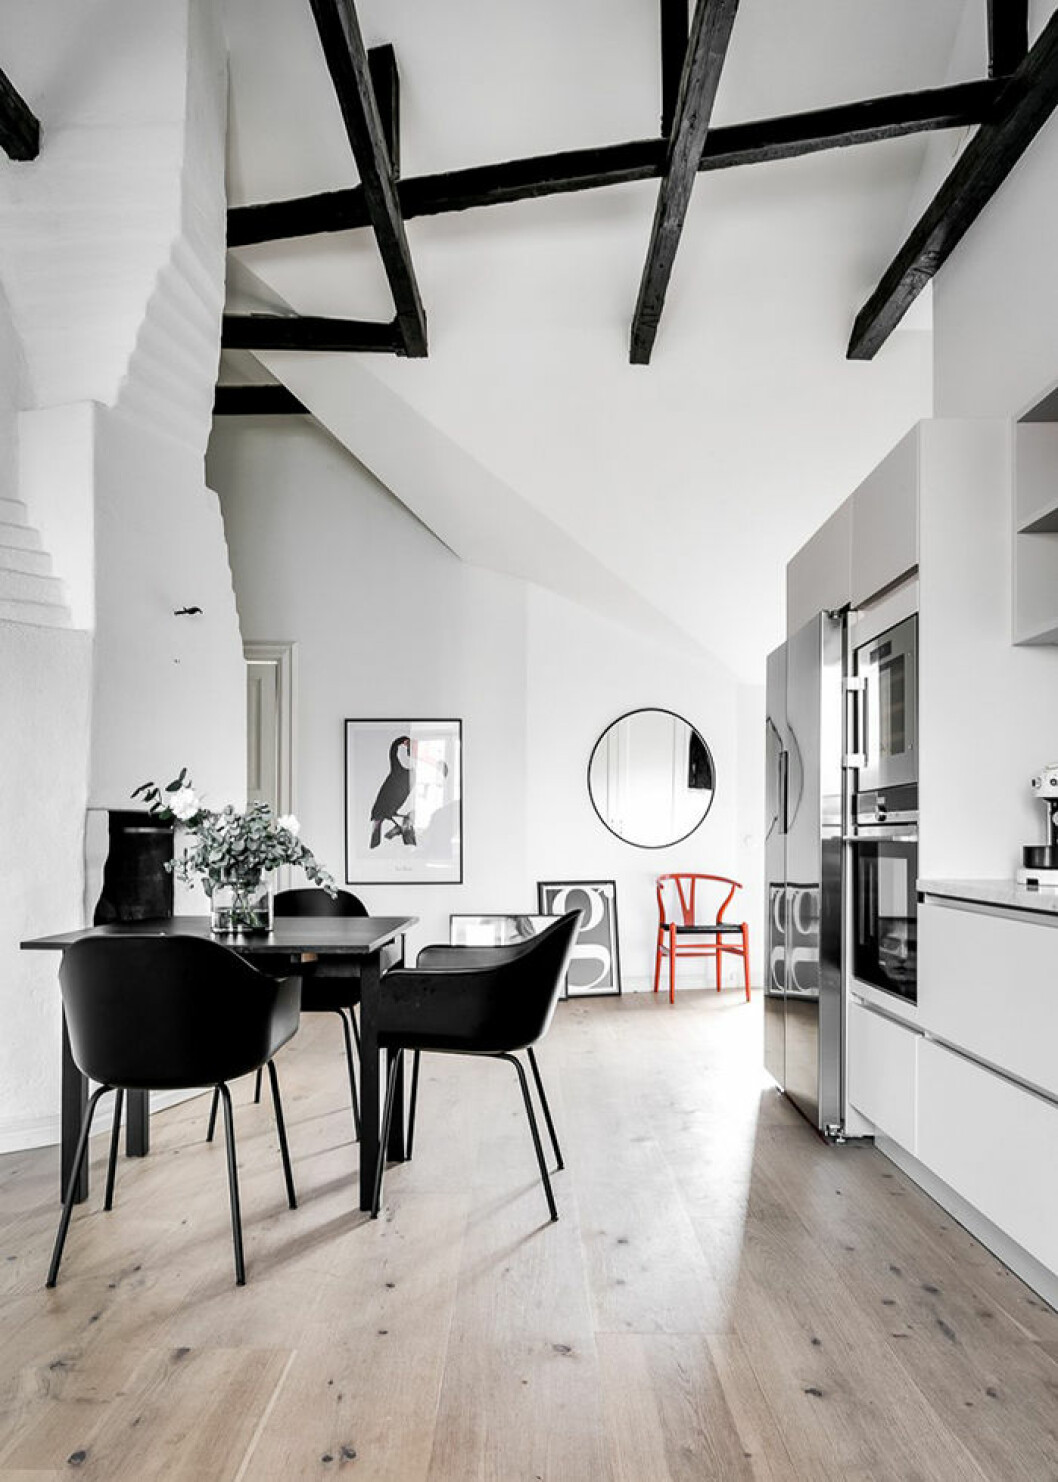 Nu säljer Margaux Dietz sitt hem i Stockholm